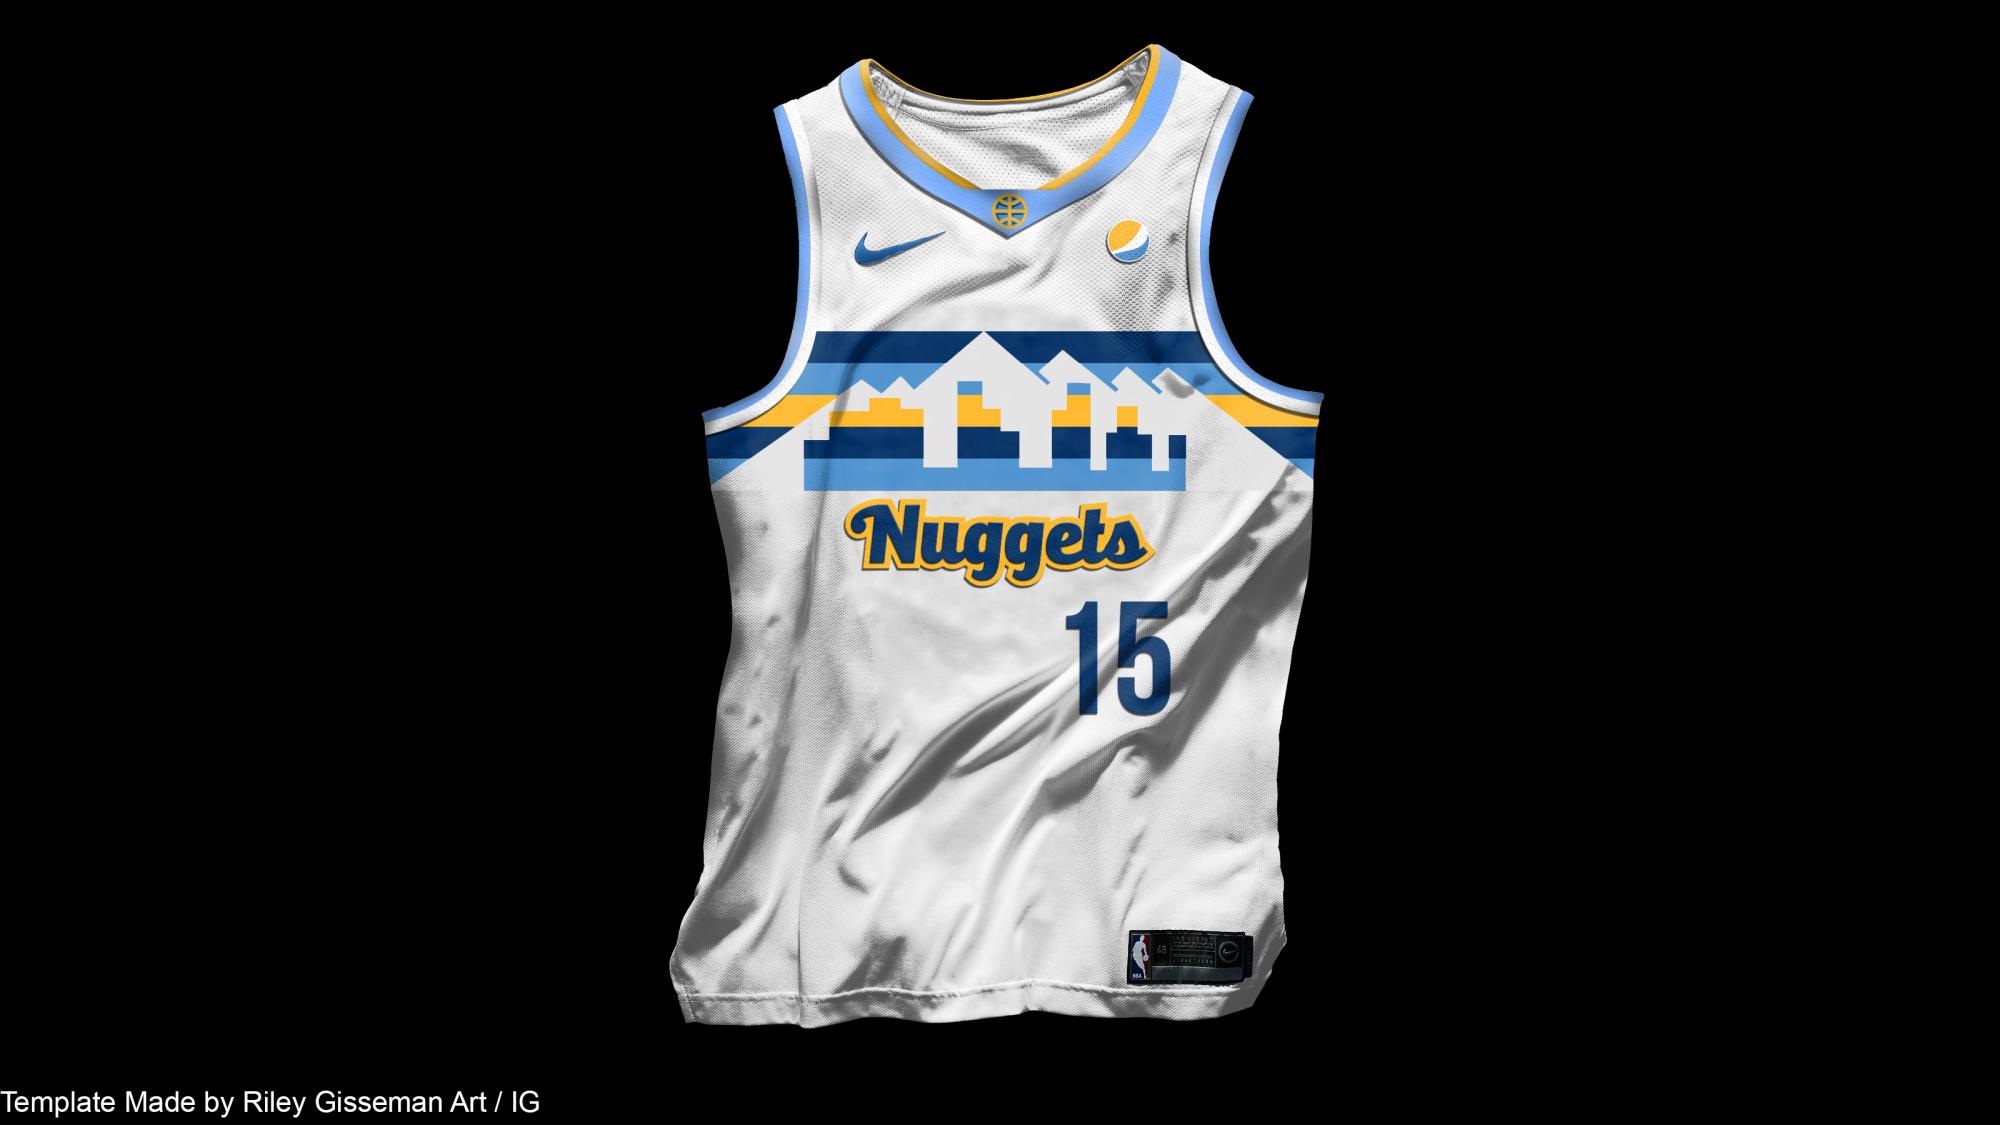 Nike Nba Basketball Template 3 0 Concepts Chris Creamer S Sports Logos Community Ccslc Sportslogos Net Forums